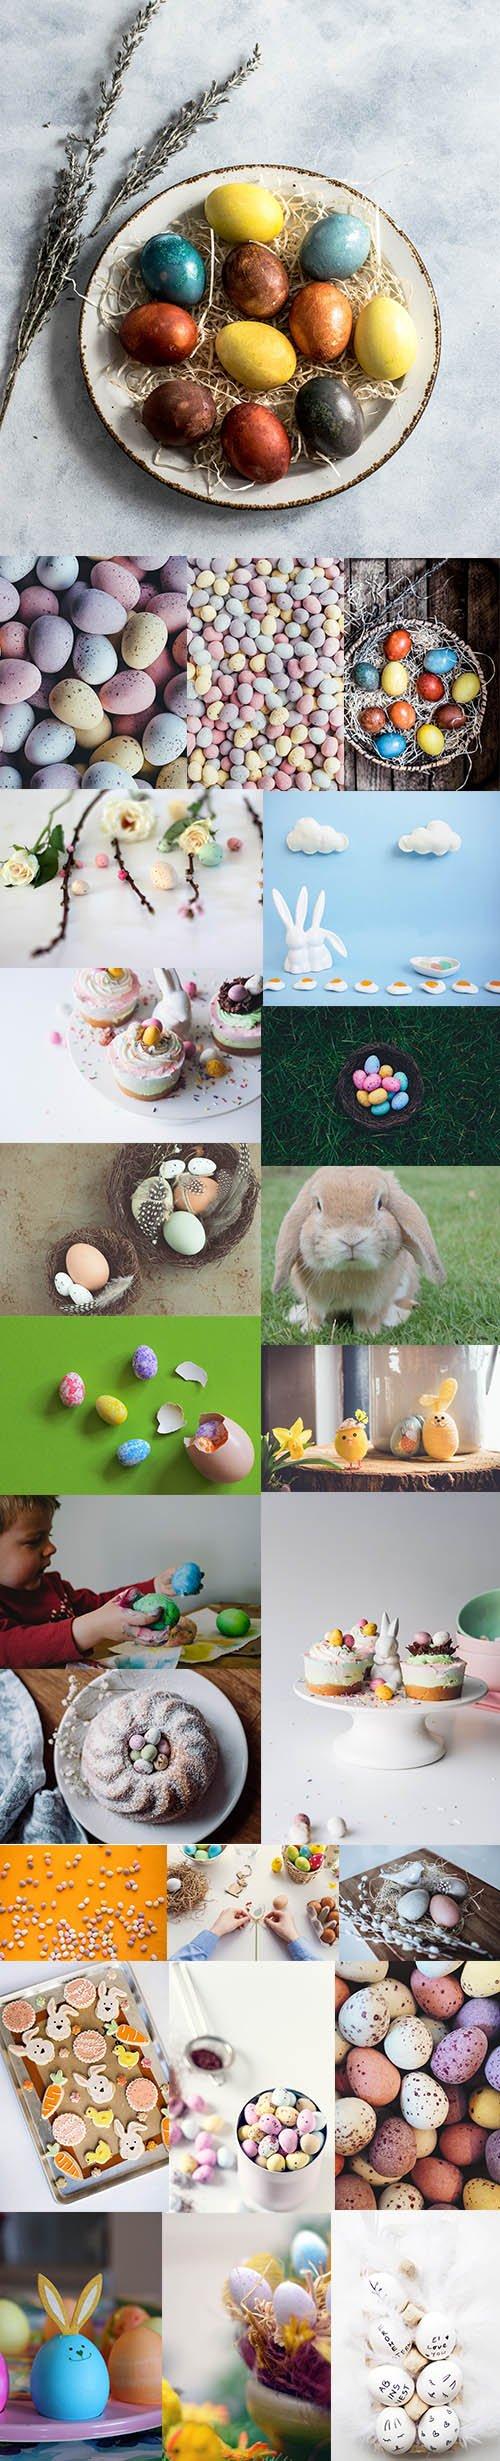 Happy Easter Bundle - UHQ Stock Photo